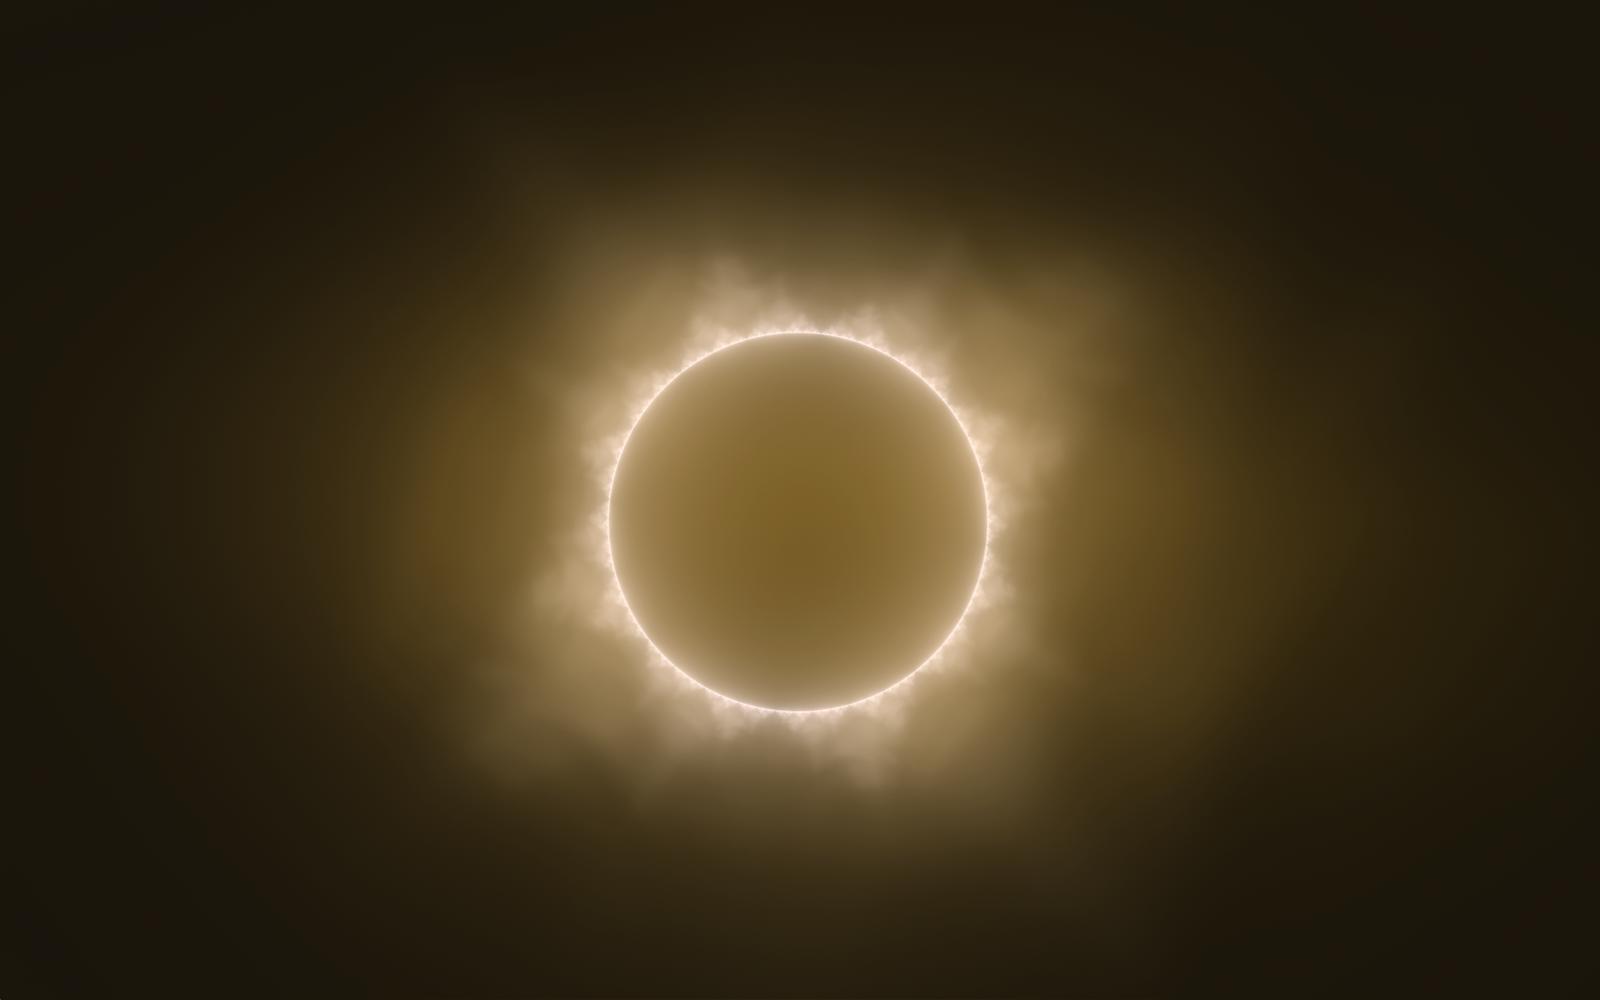 Black Hole Sun (1680x1050) by Konimotsinui on DeviantArt